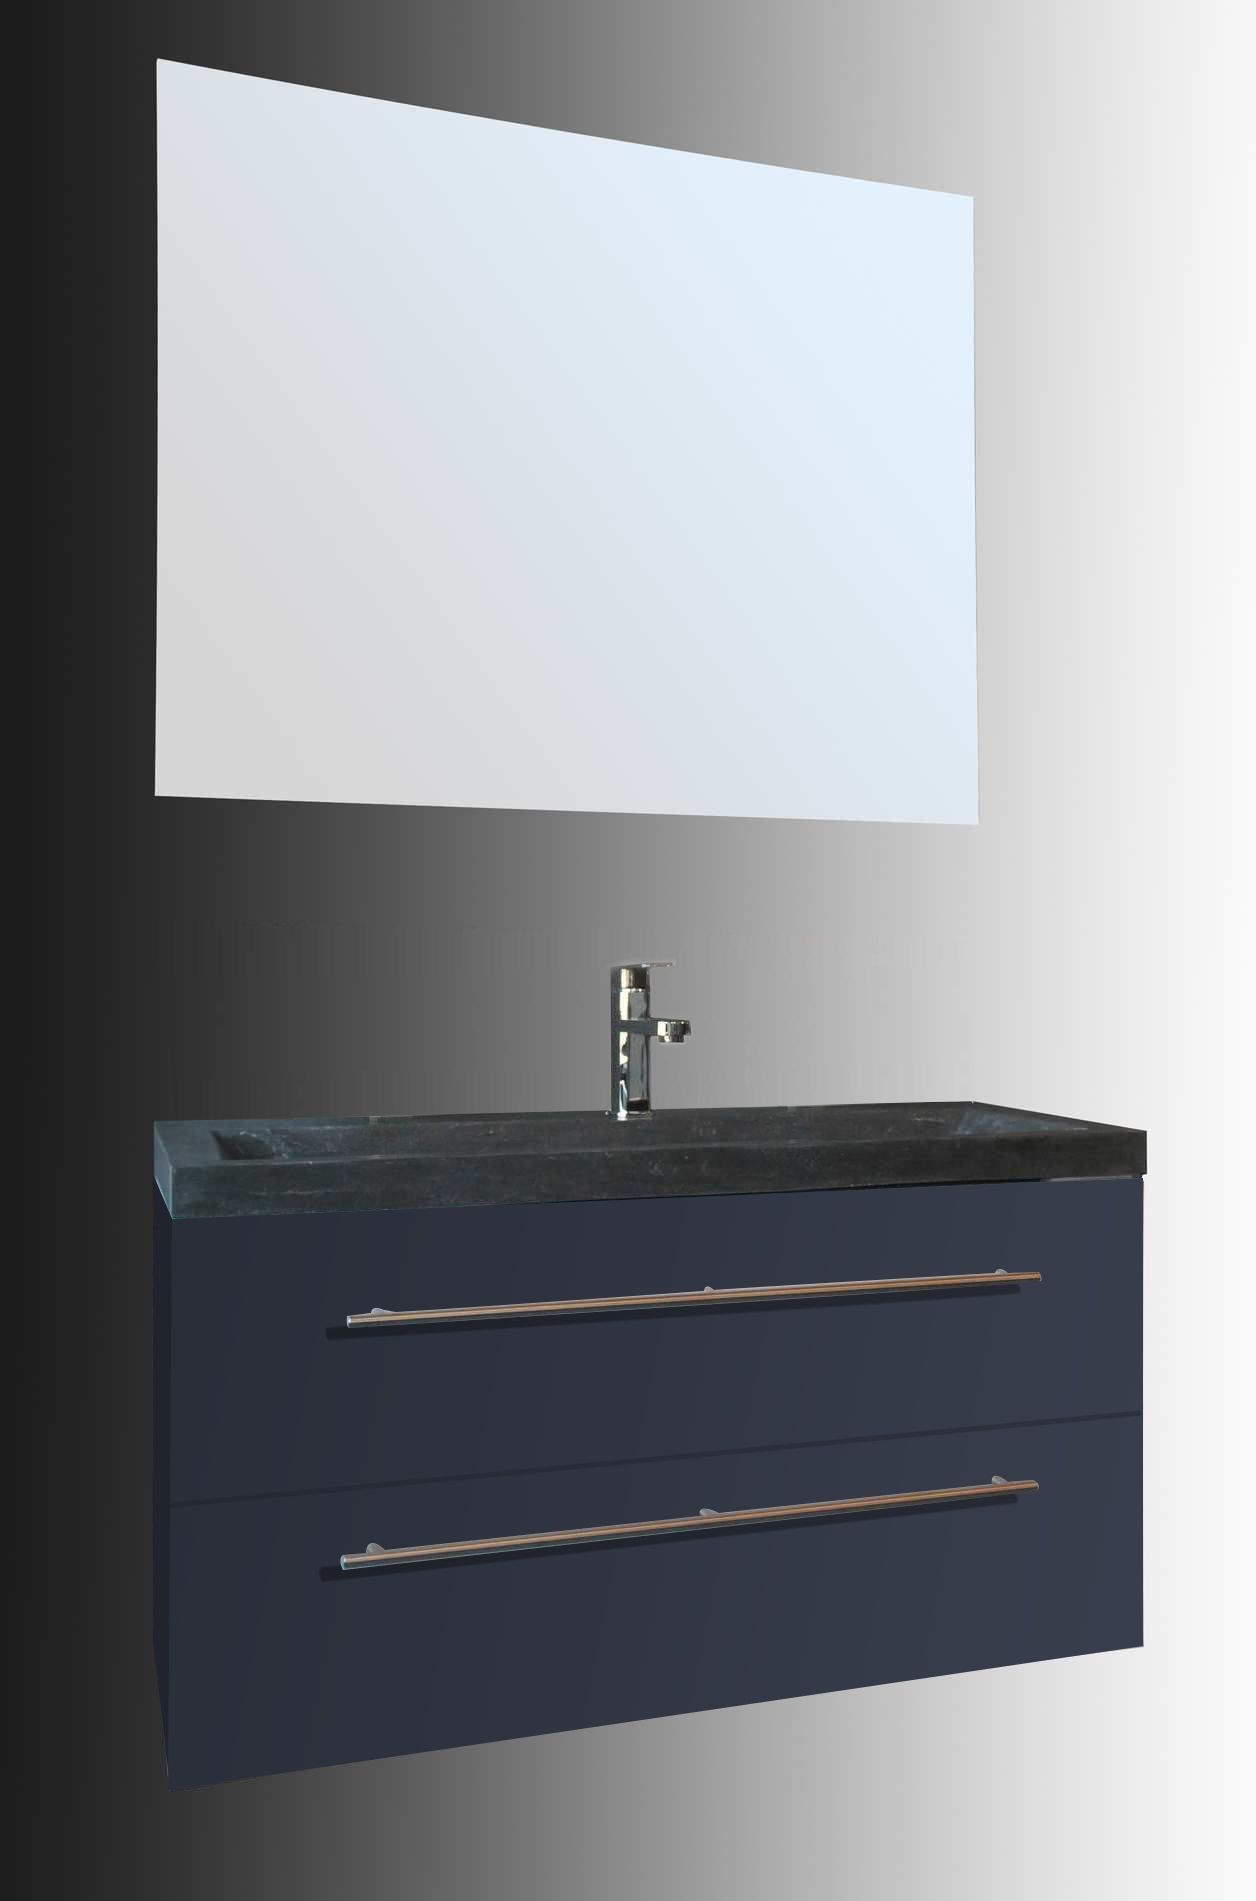 Lambini Designs Compact Stone badkamermeubel hoogglans antraciet 100cm, 1 kraangat